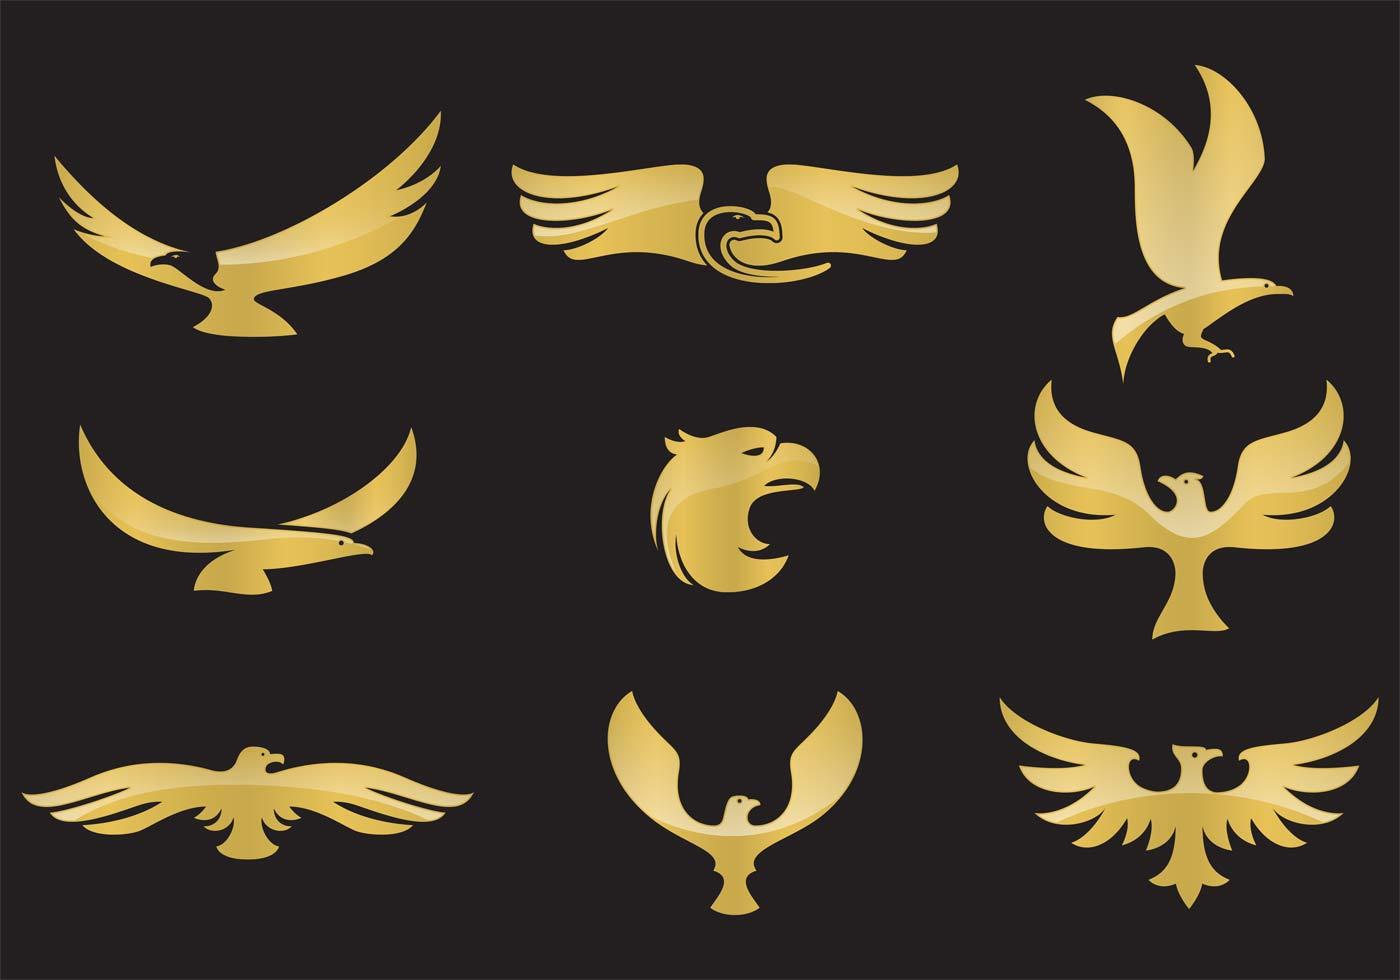 golden eagle vectors download free vector art stock